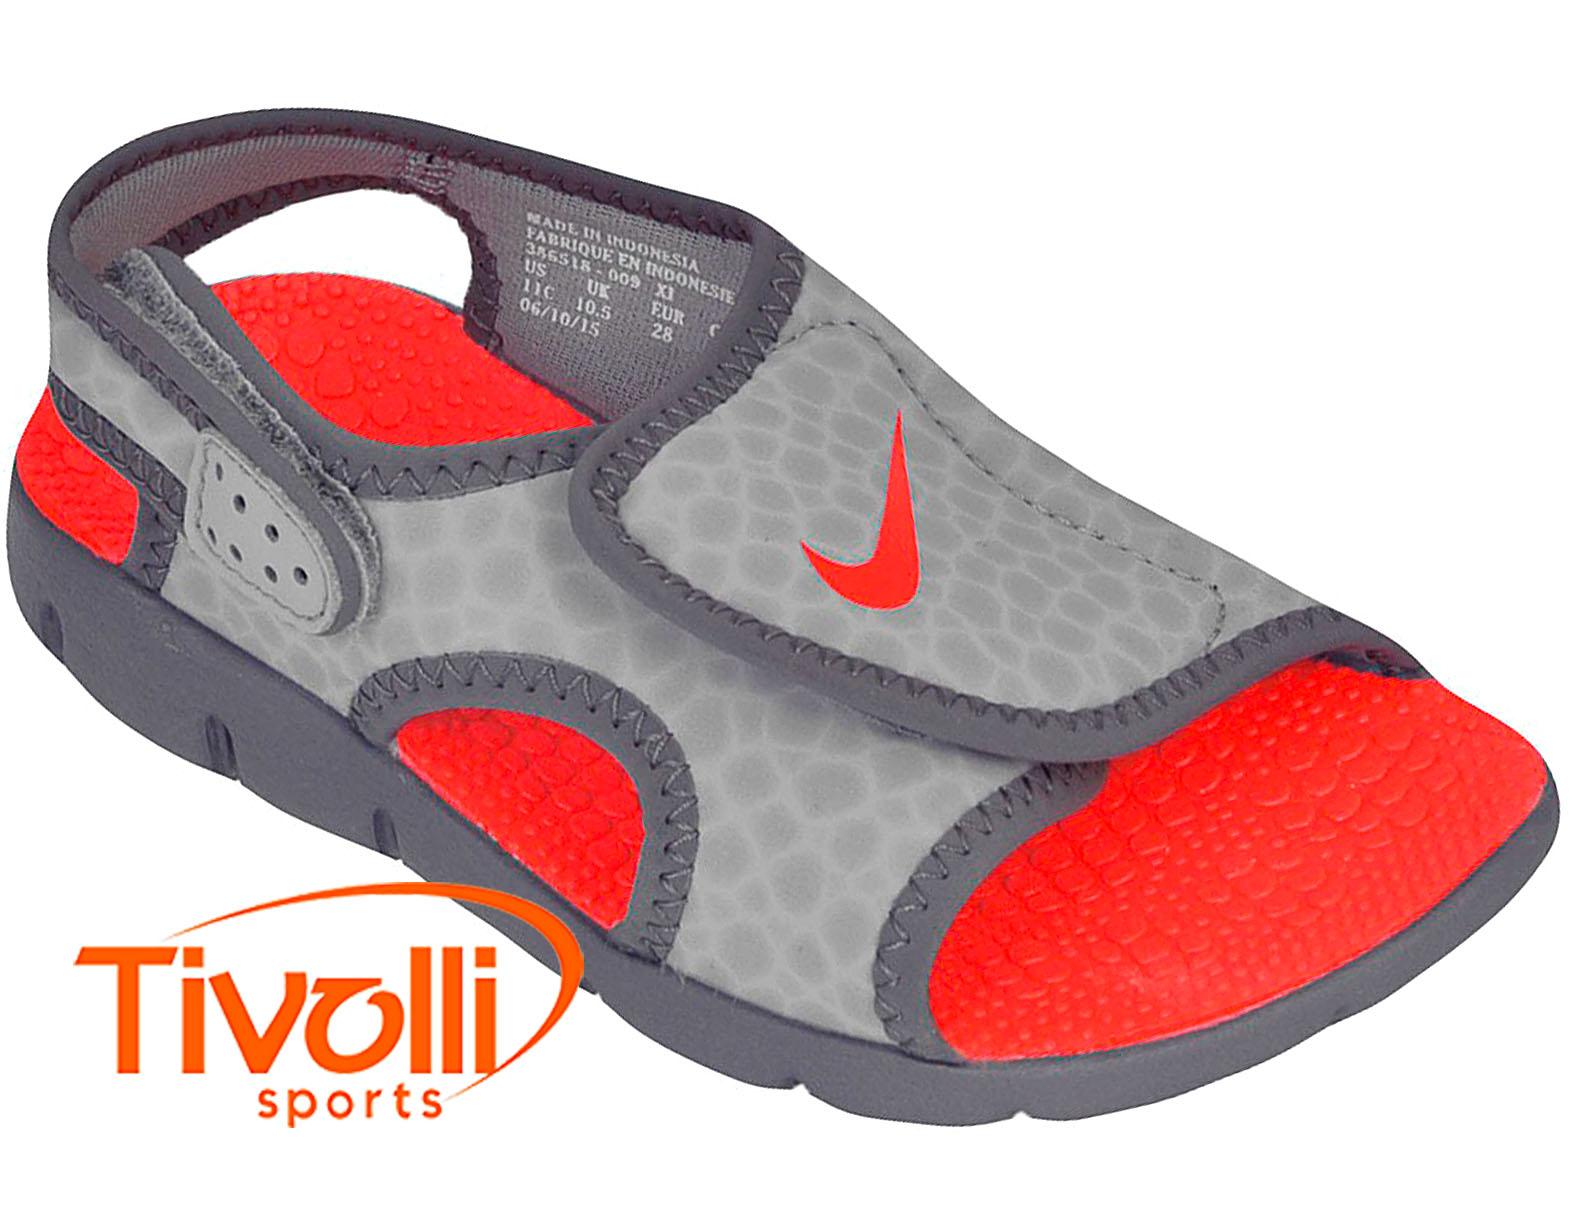 1f738ddc1 Sandália Nike Sunray Adjust 4 Infantil (GS/PS) 27 ao 33,5 Cinza e Laranja